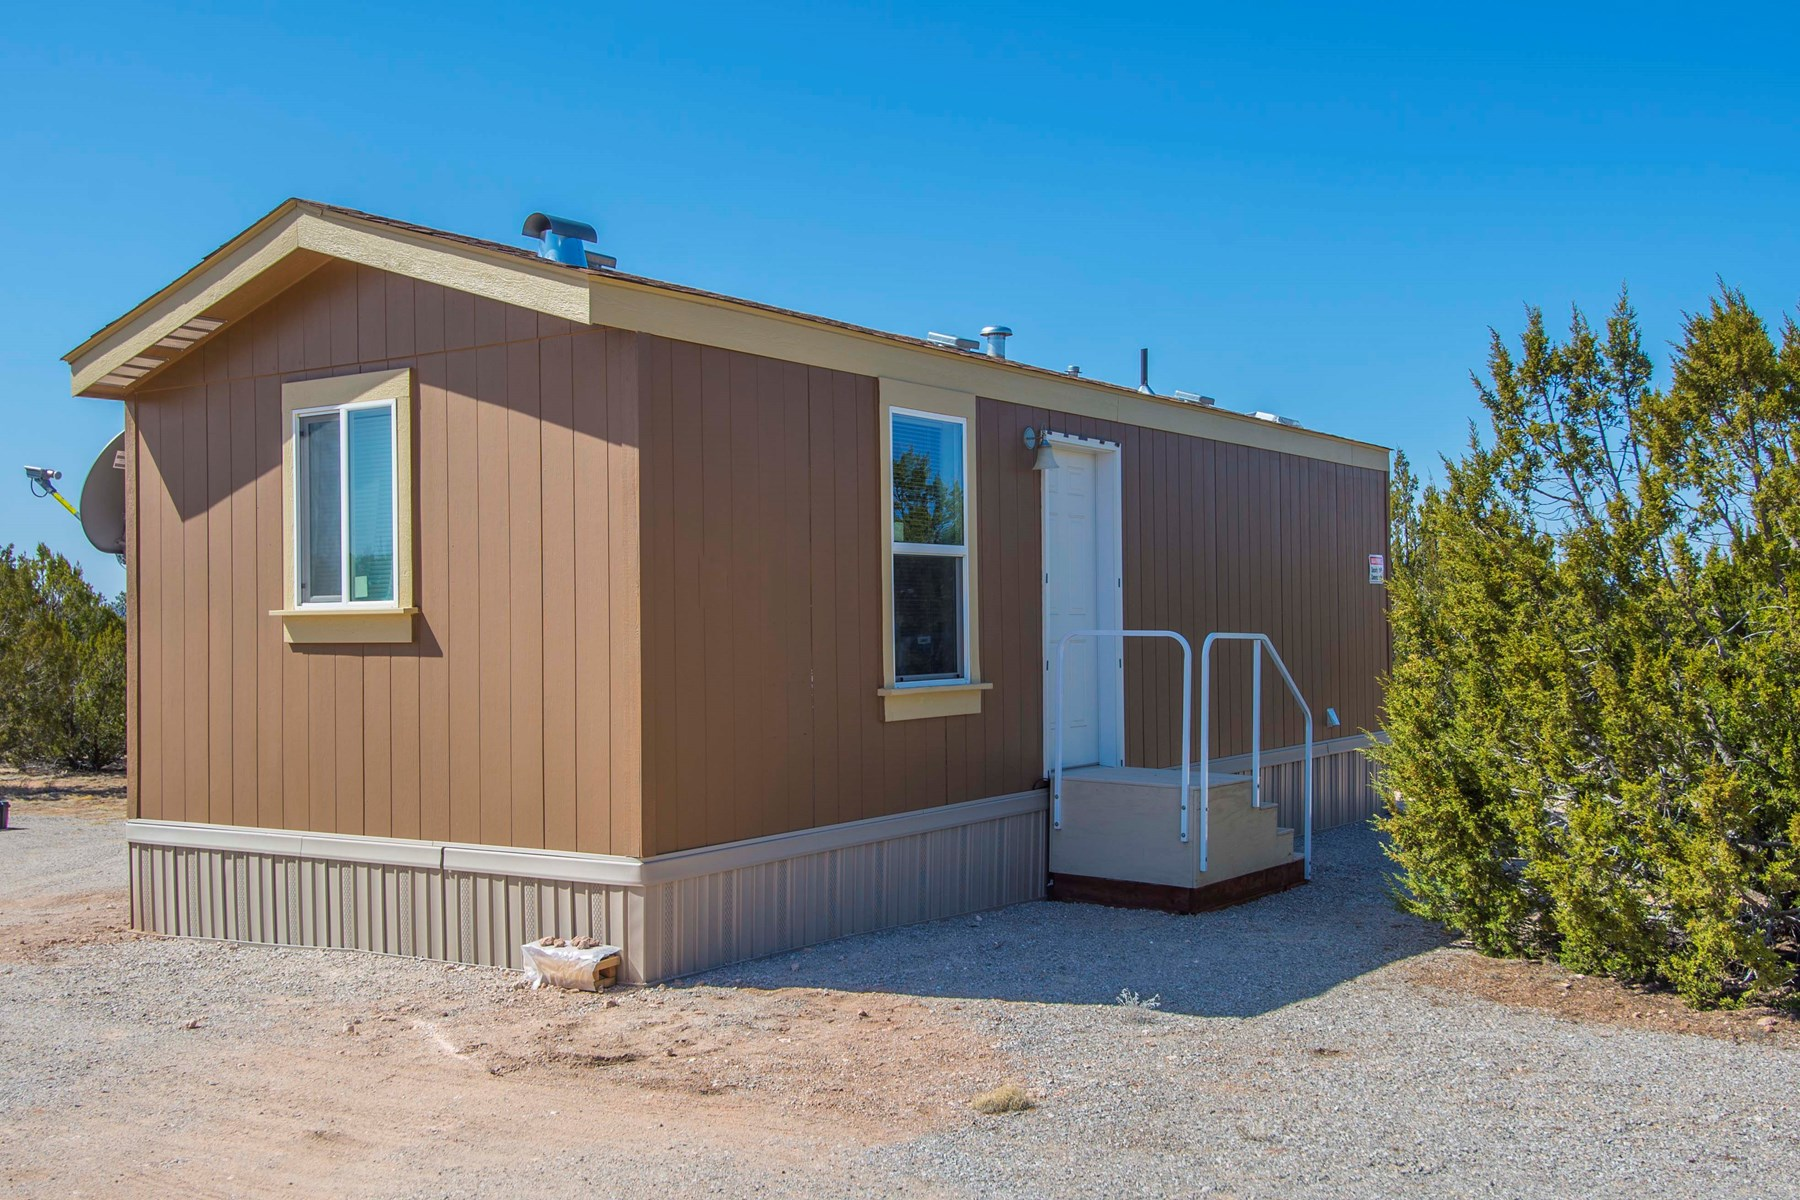 Tiny Home for Sale on 1.57 Acres Northern Arizona